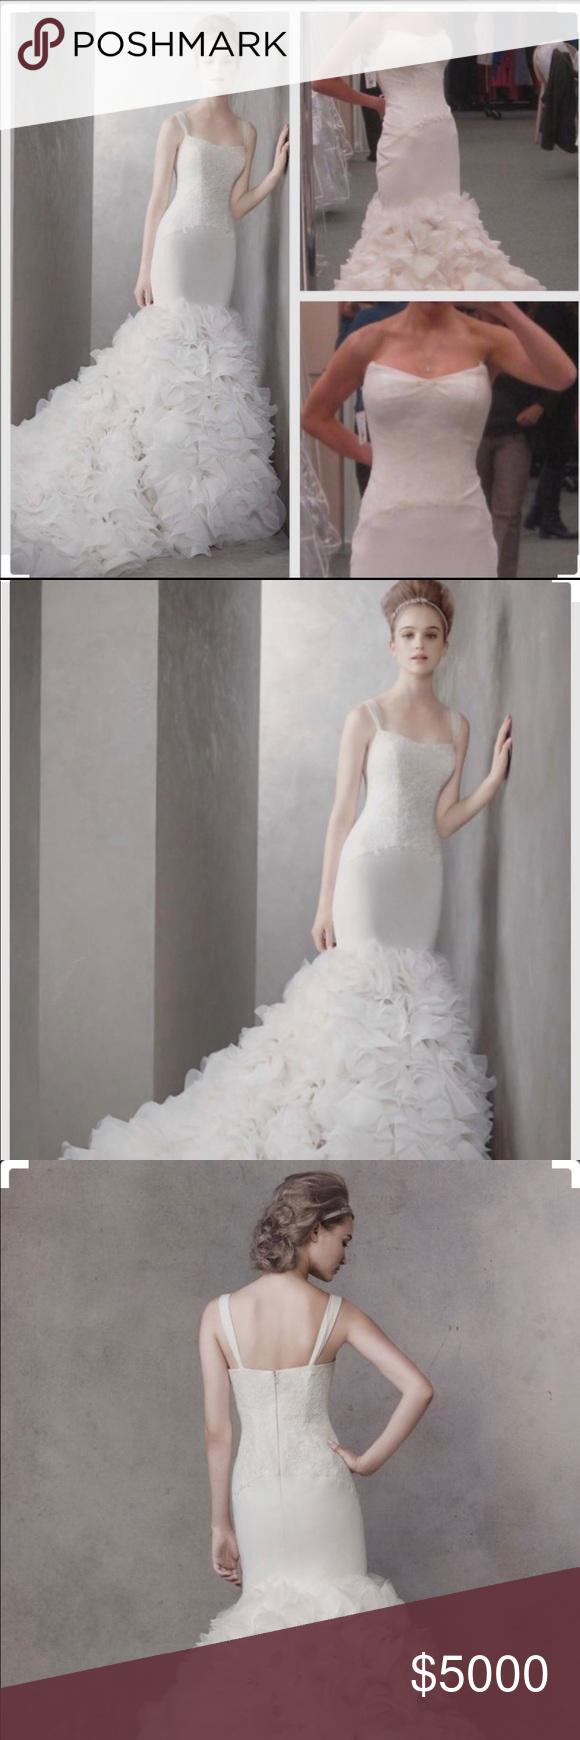 Vera Wang Wedding Dress NWT | Vera wang wedding dresses, Vera wang ...